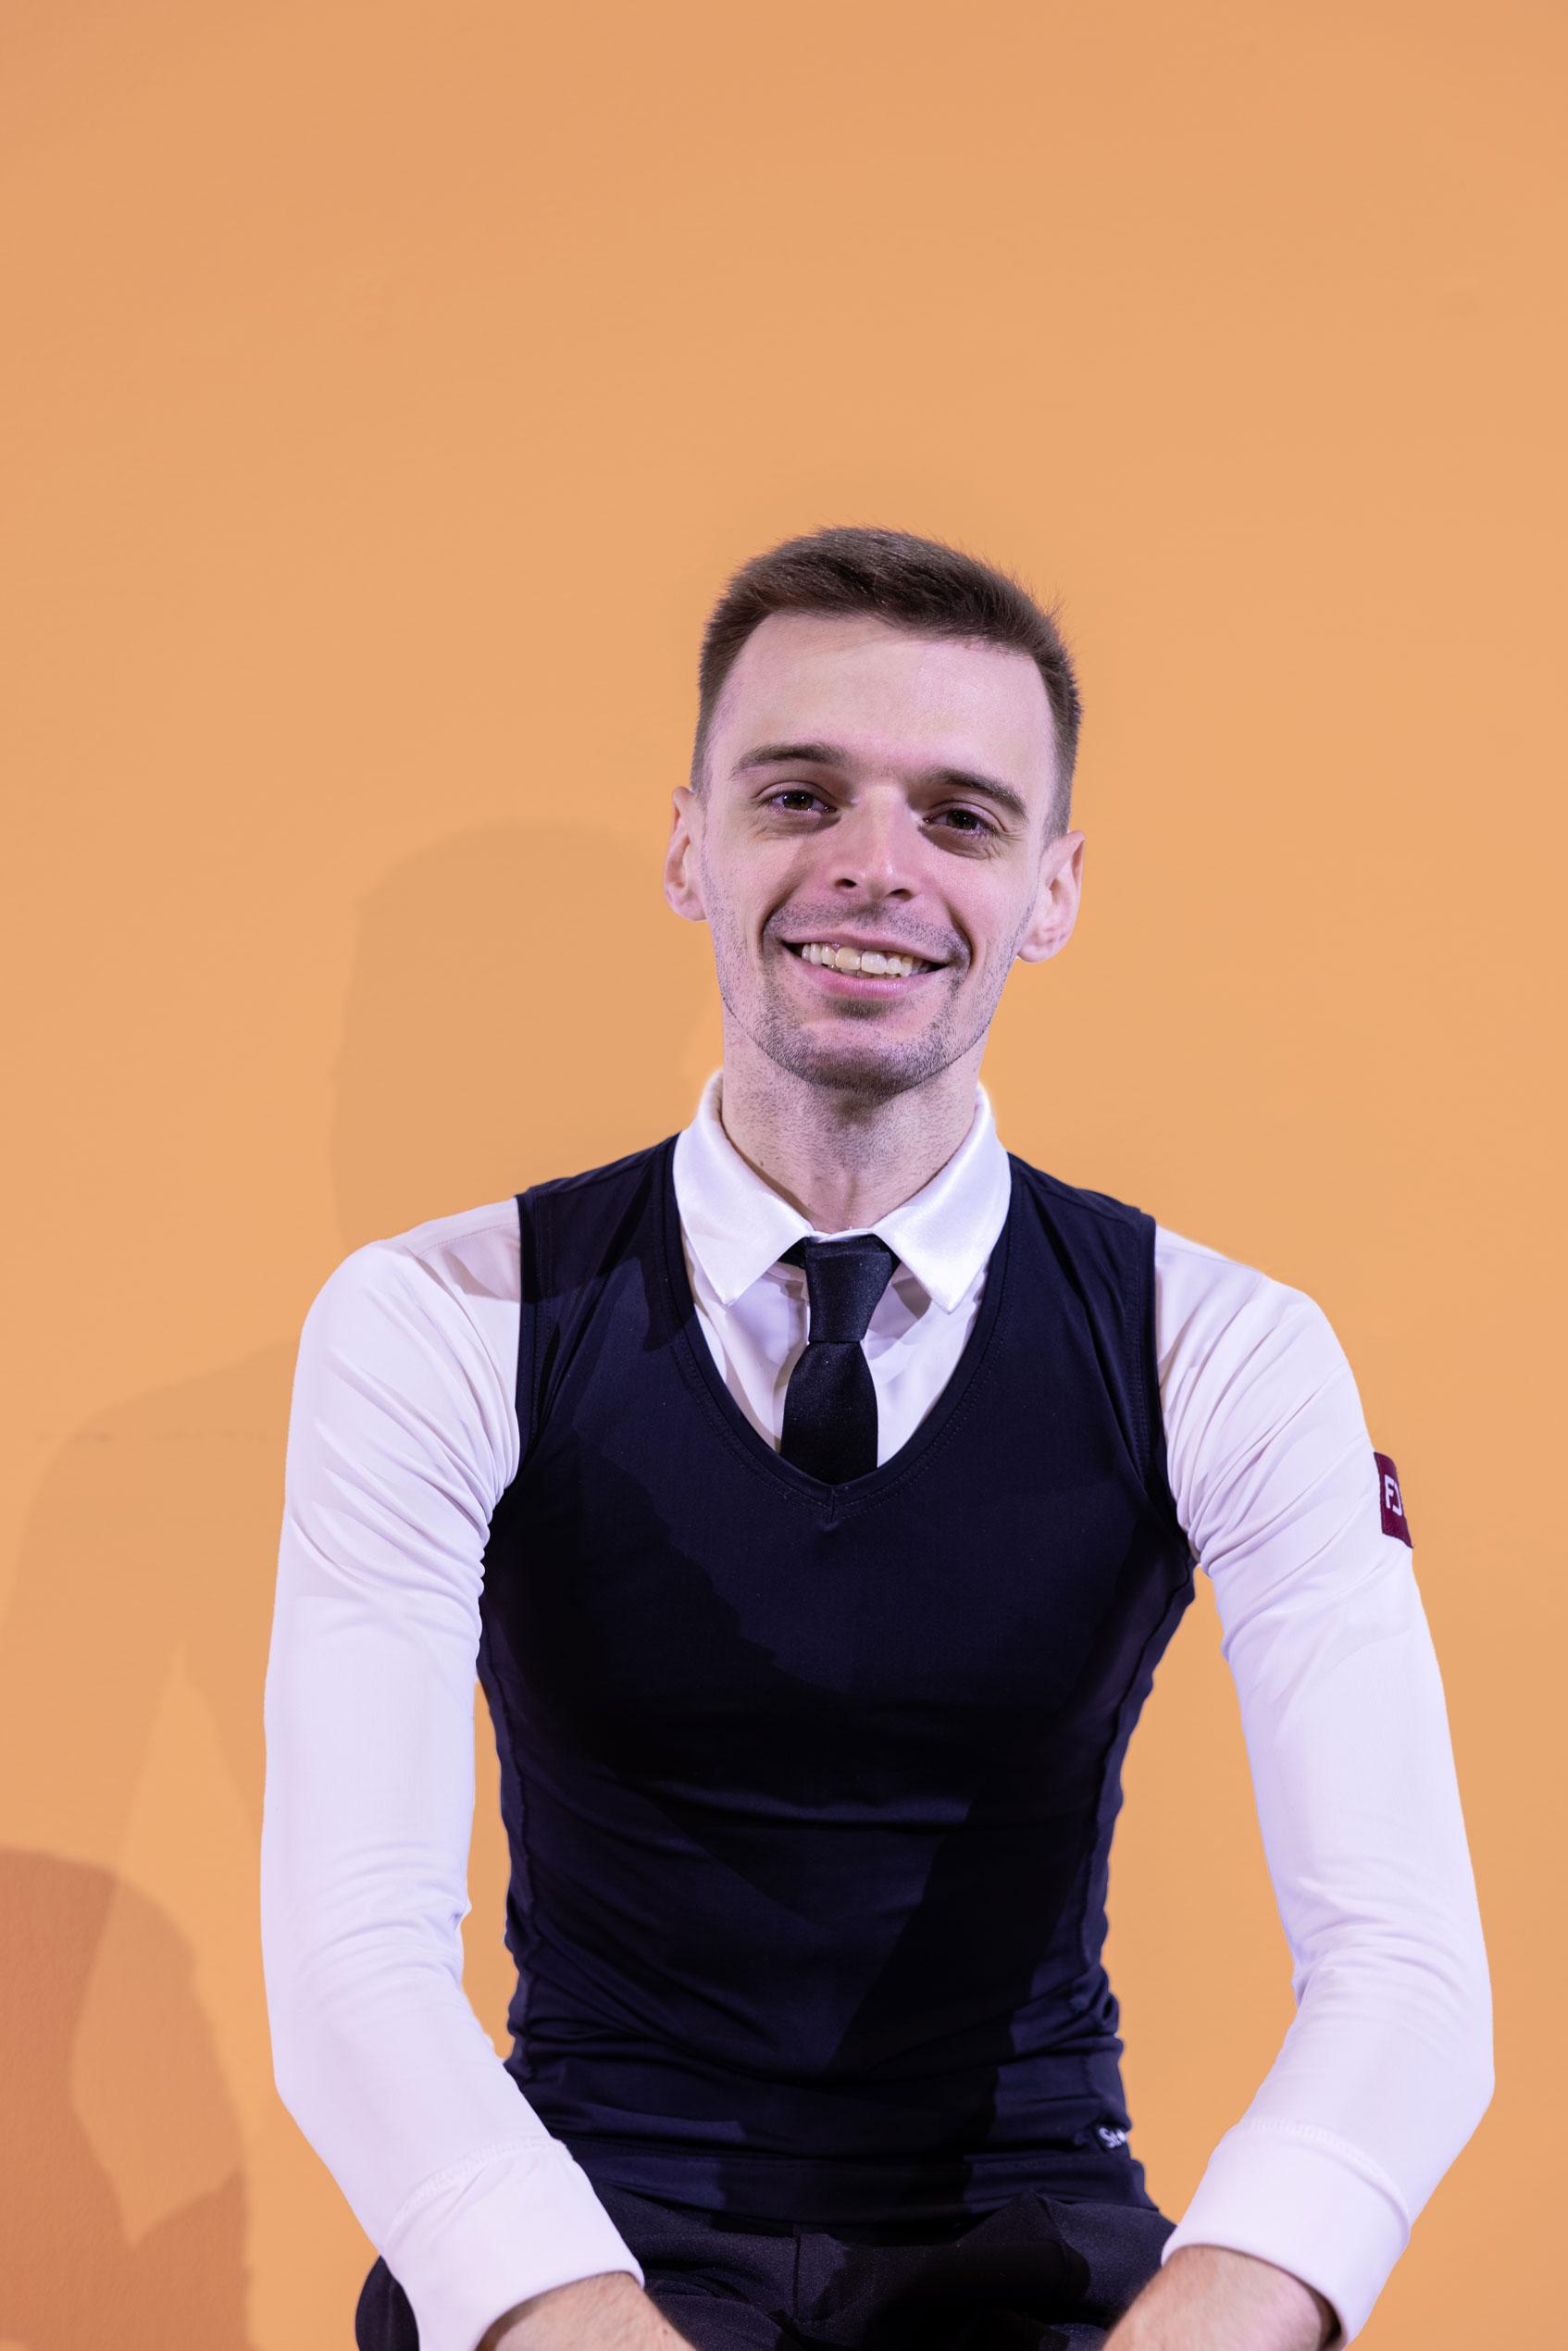 dance instructor profile picture Vladyslav Kudin